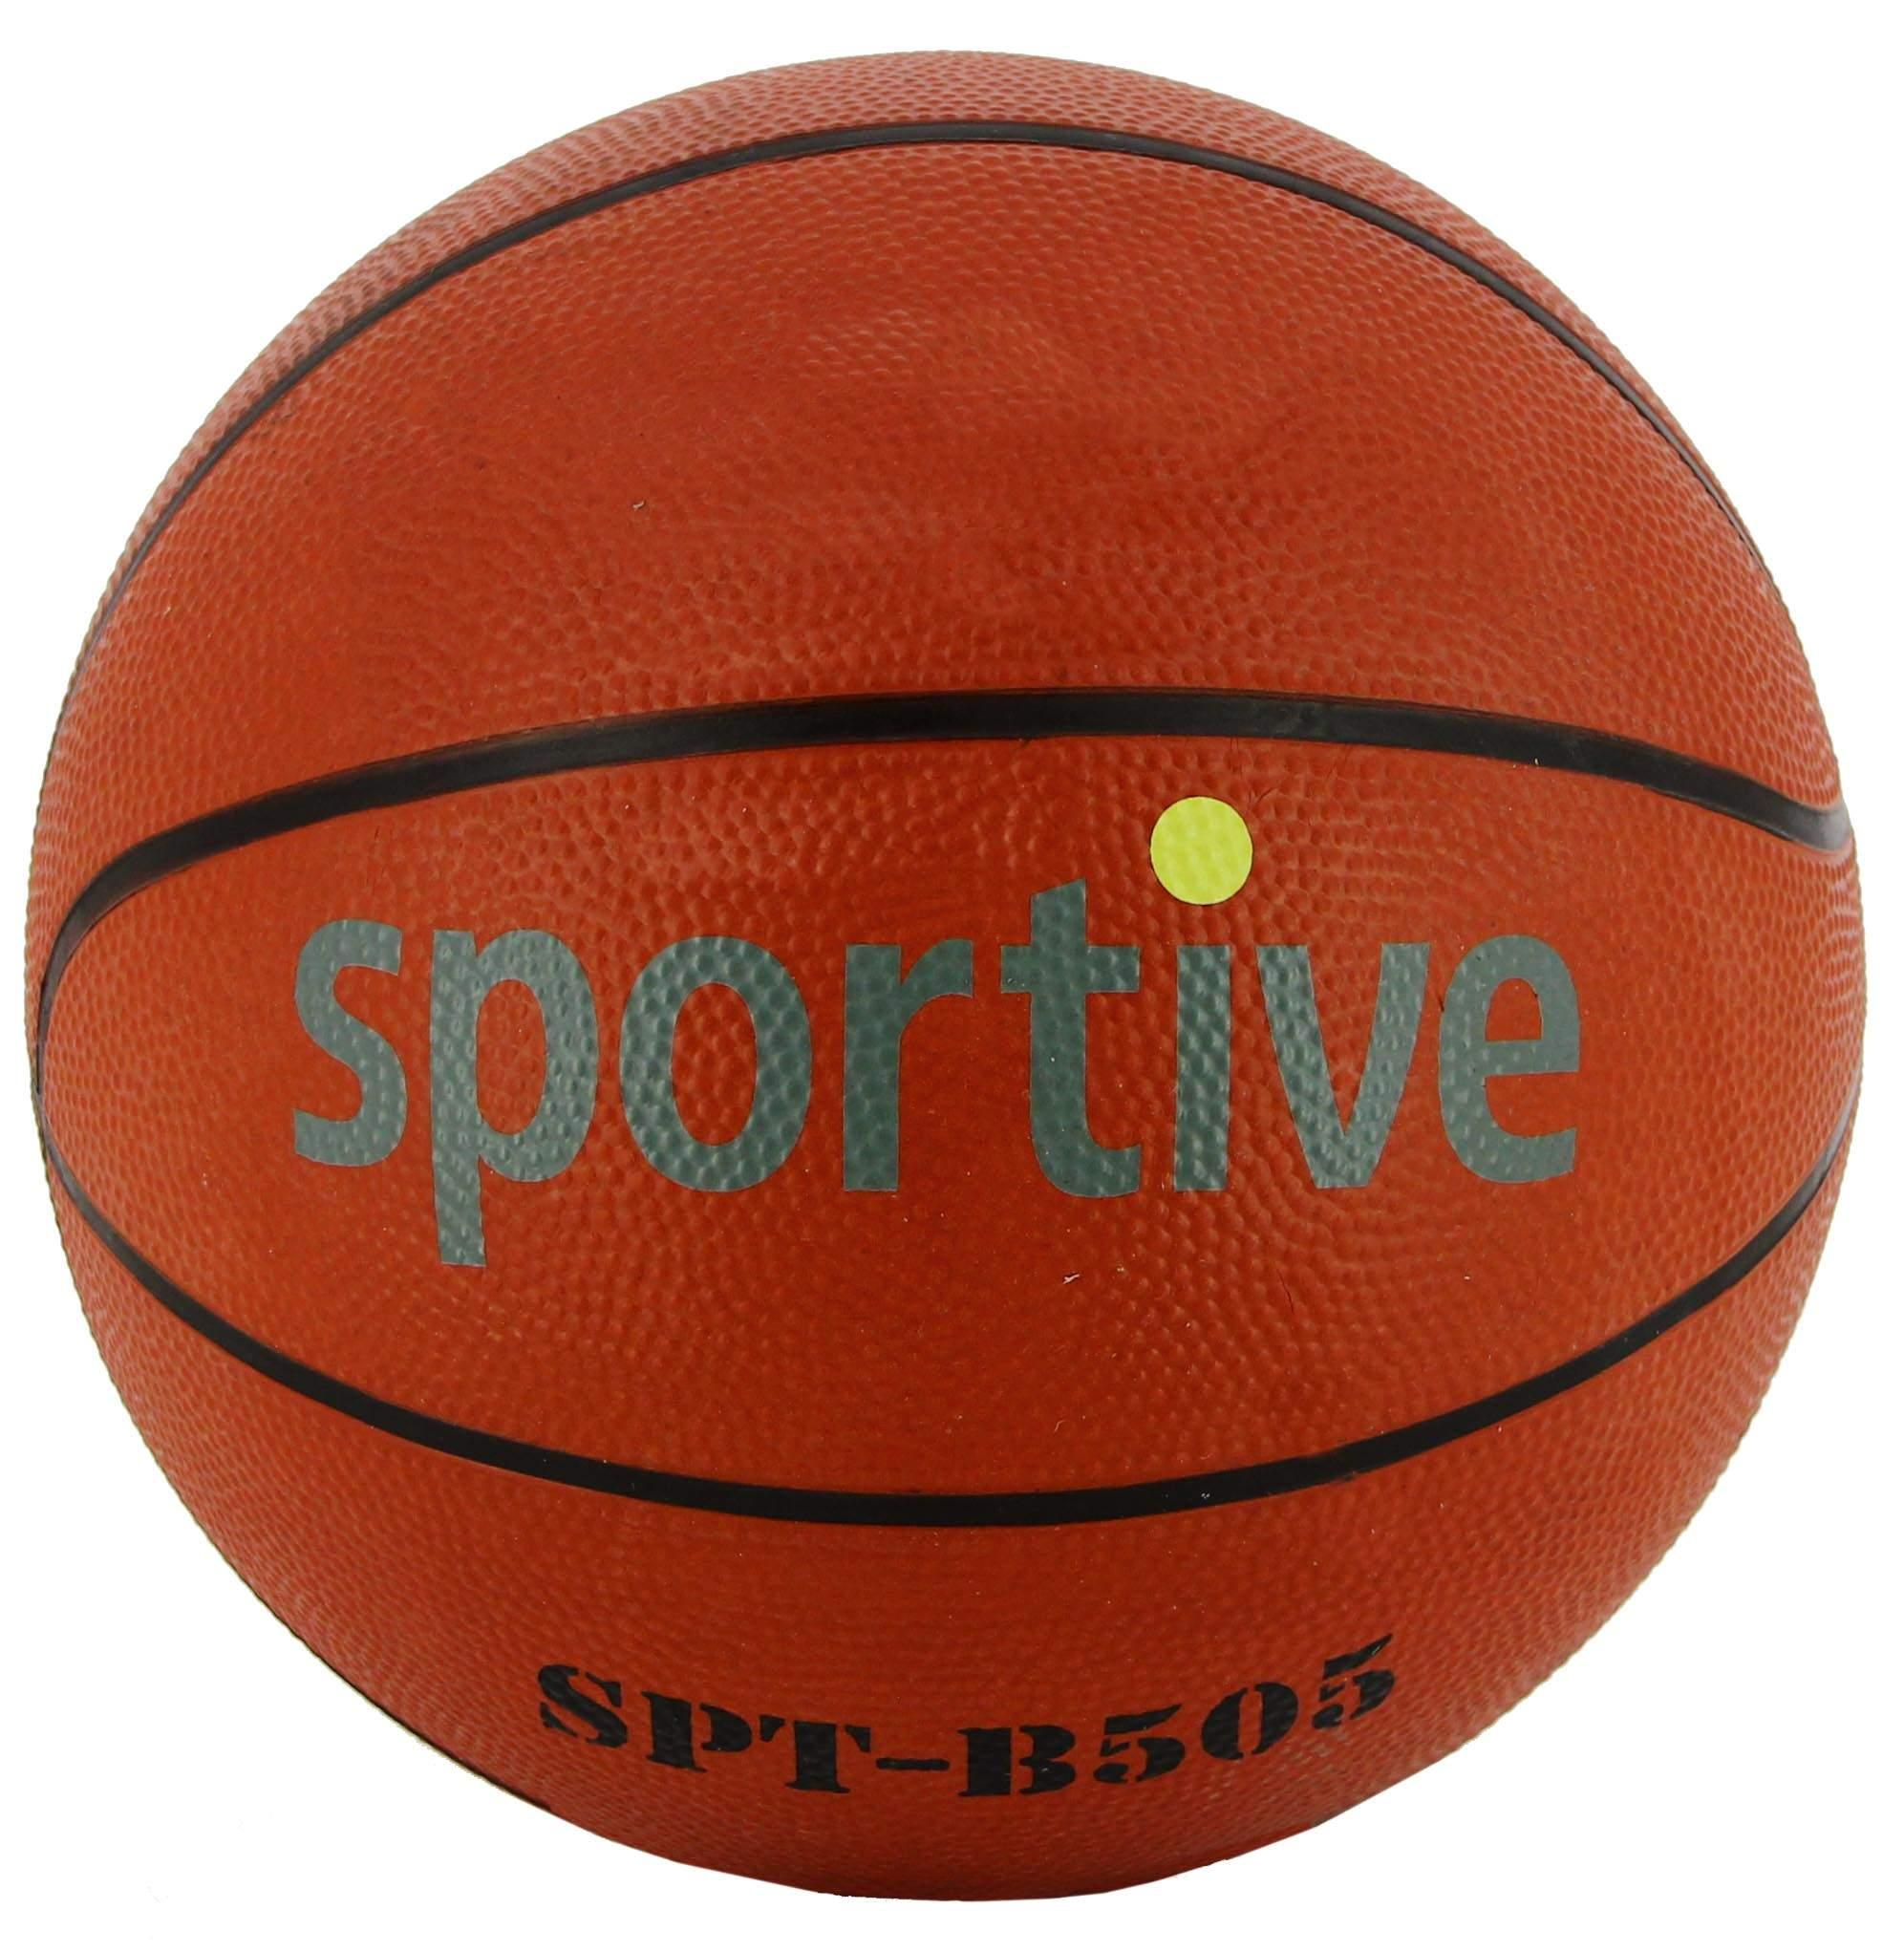 Sportive Bounce Turuncu Basketbol Topu SPT-B505